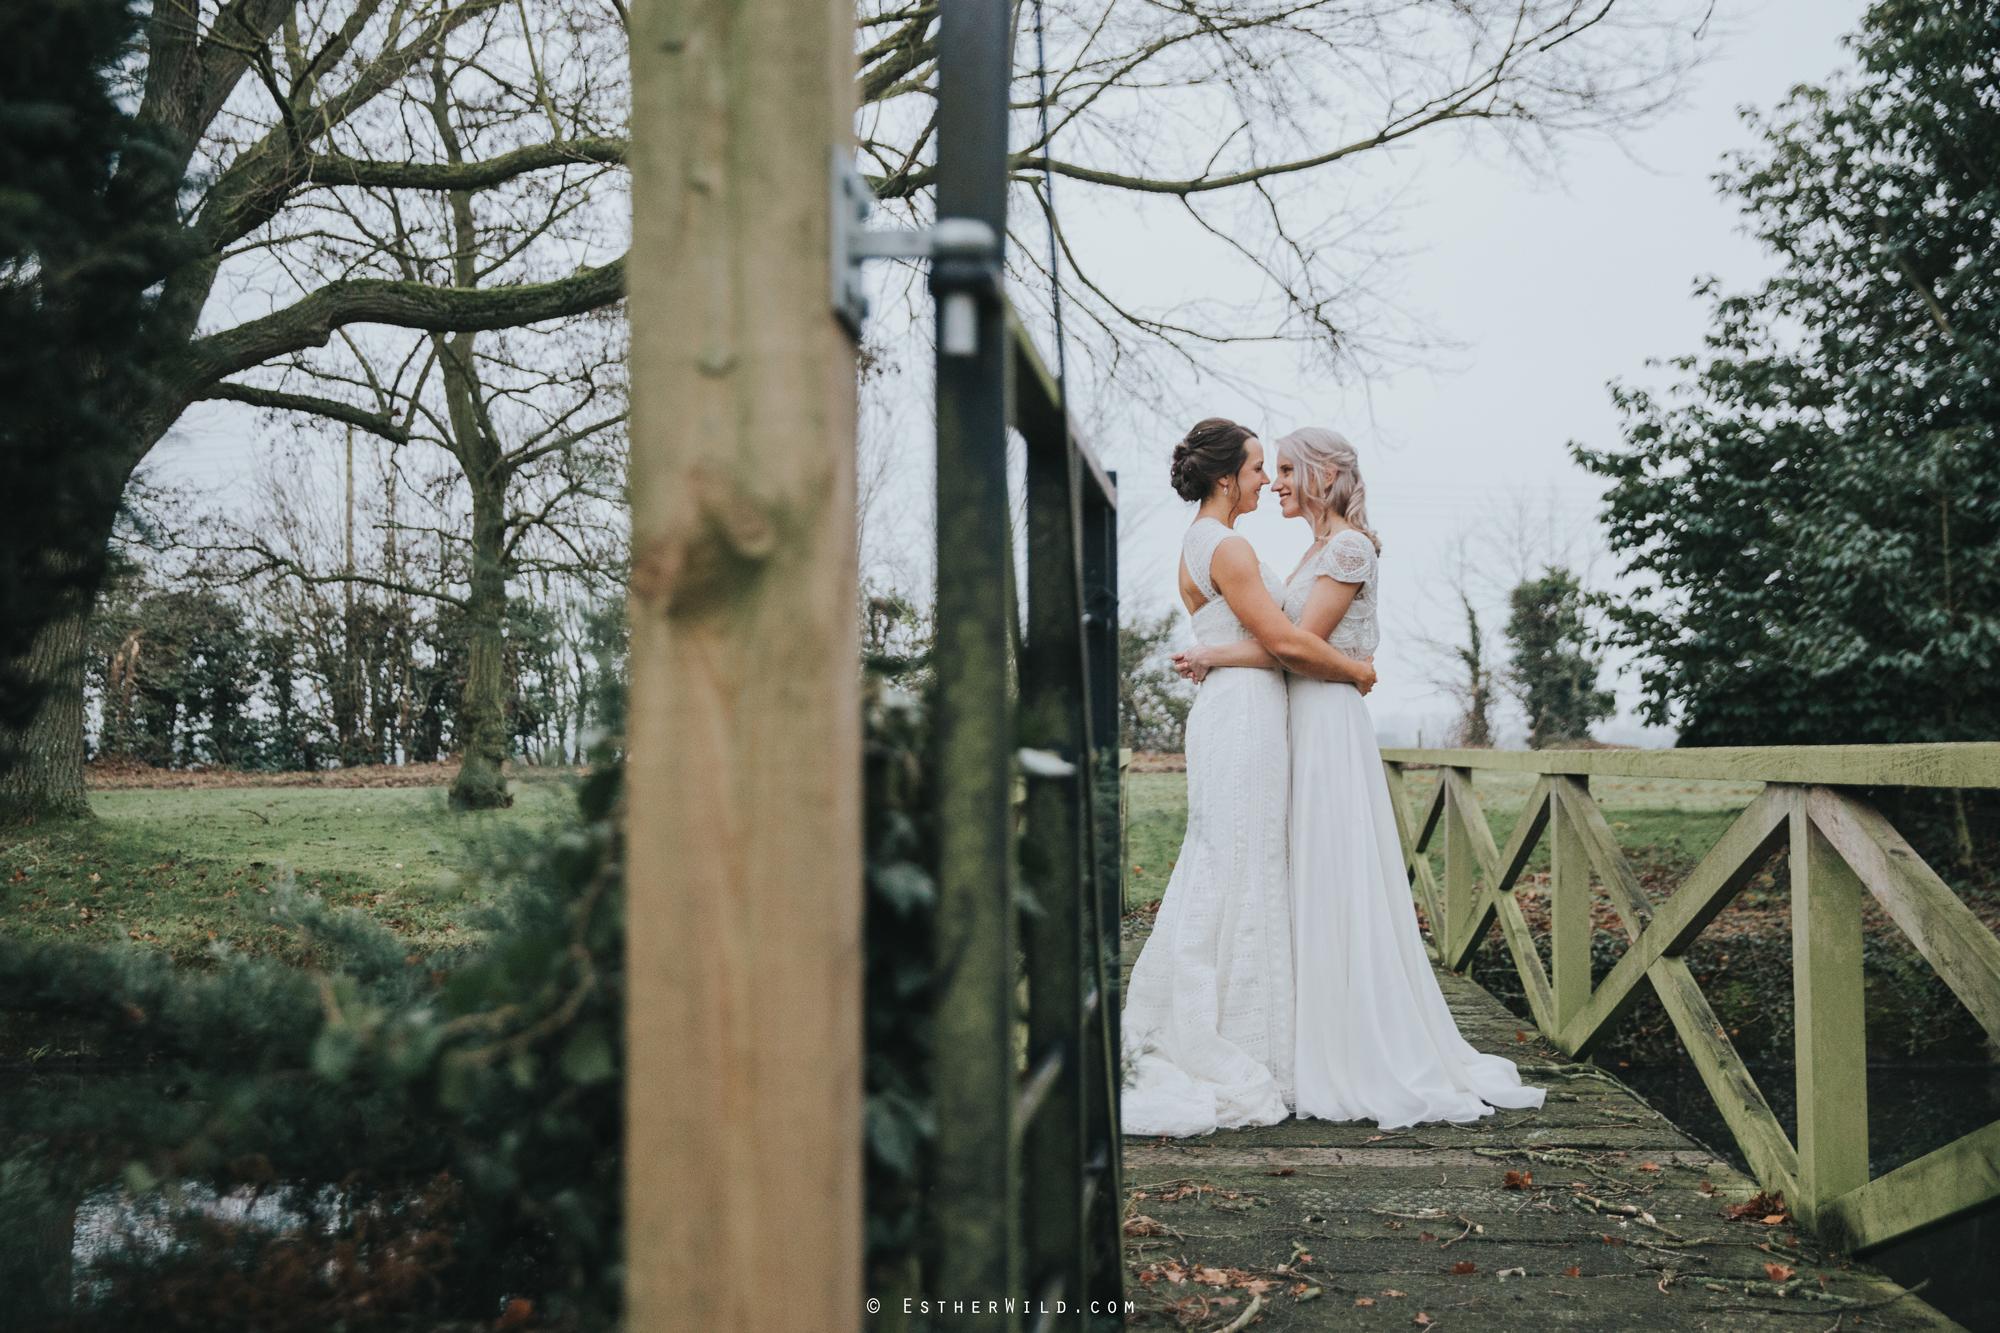 Elms_Barn_Weddings_Suffolk_Photographer_Copyright_Esther_Wild_IMG_2029.jpg